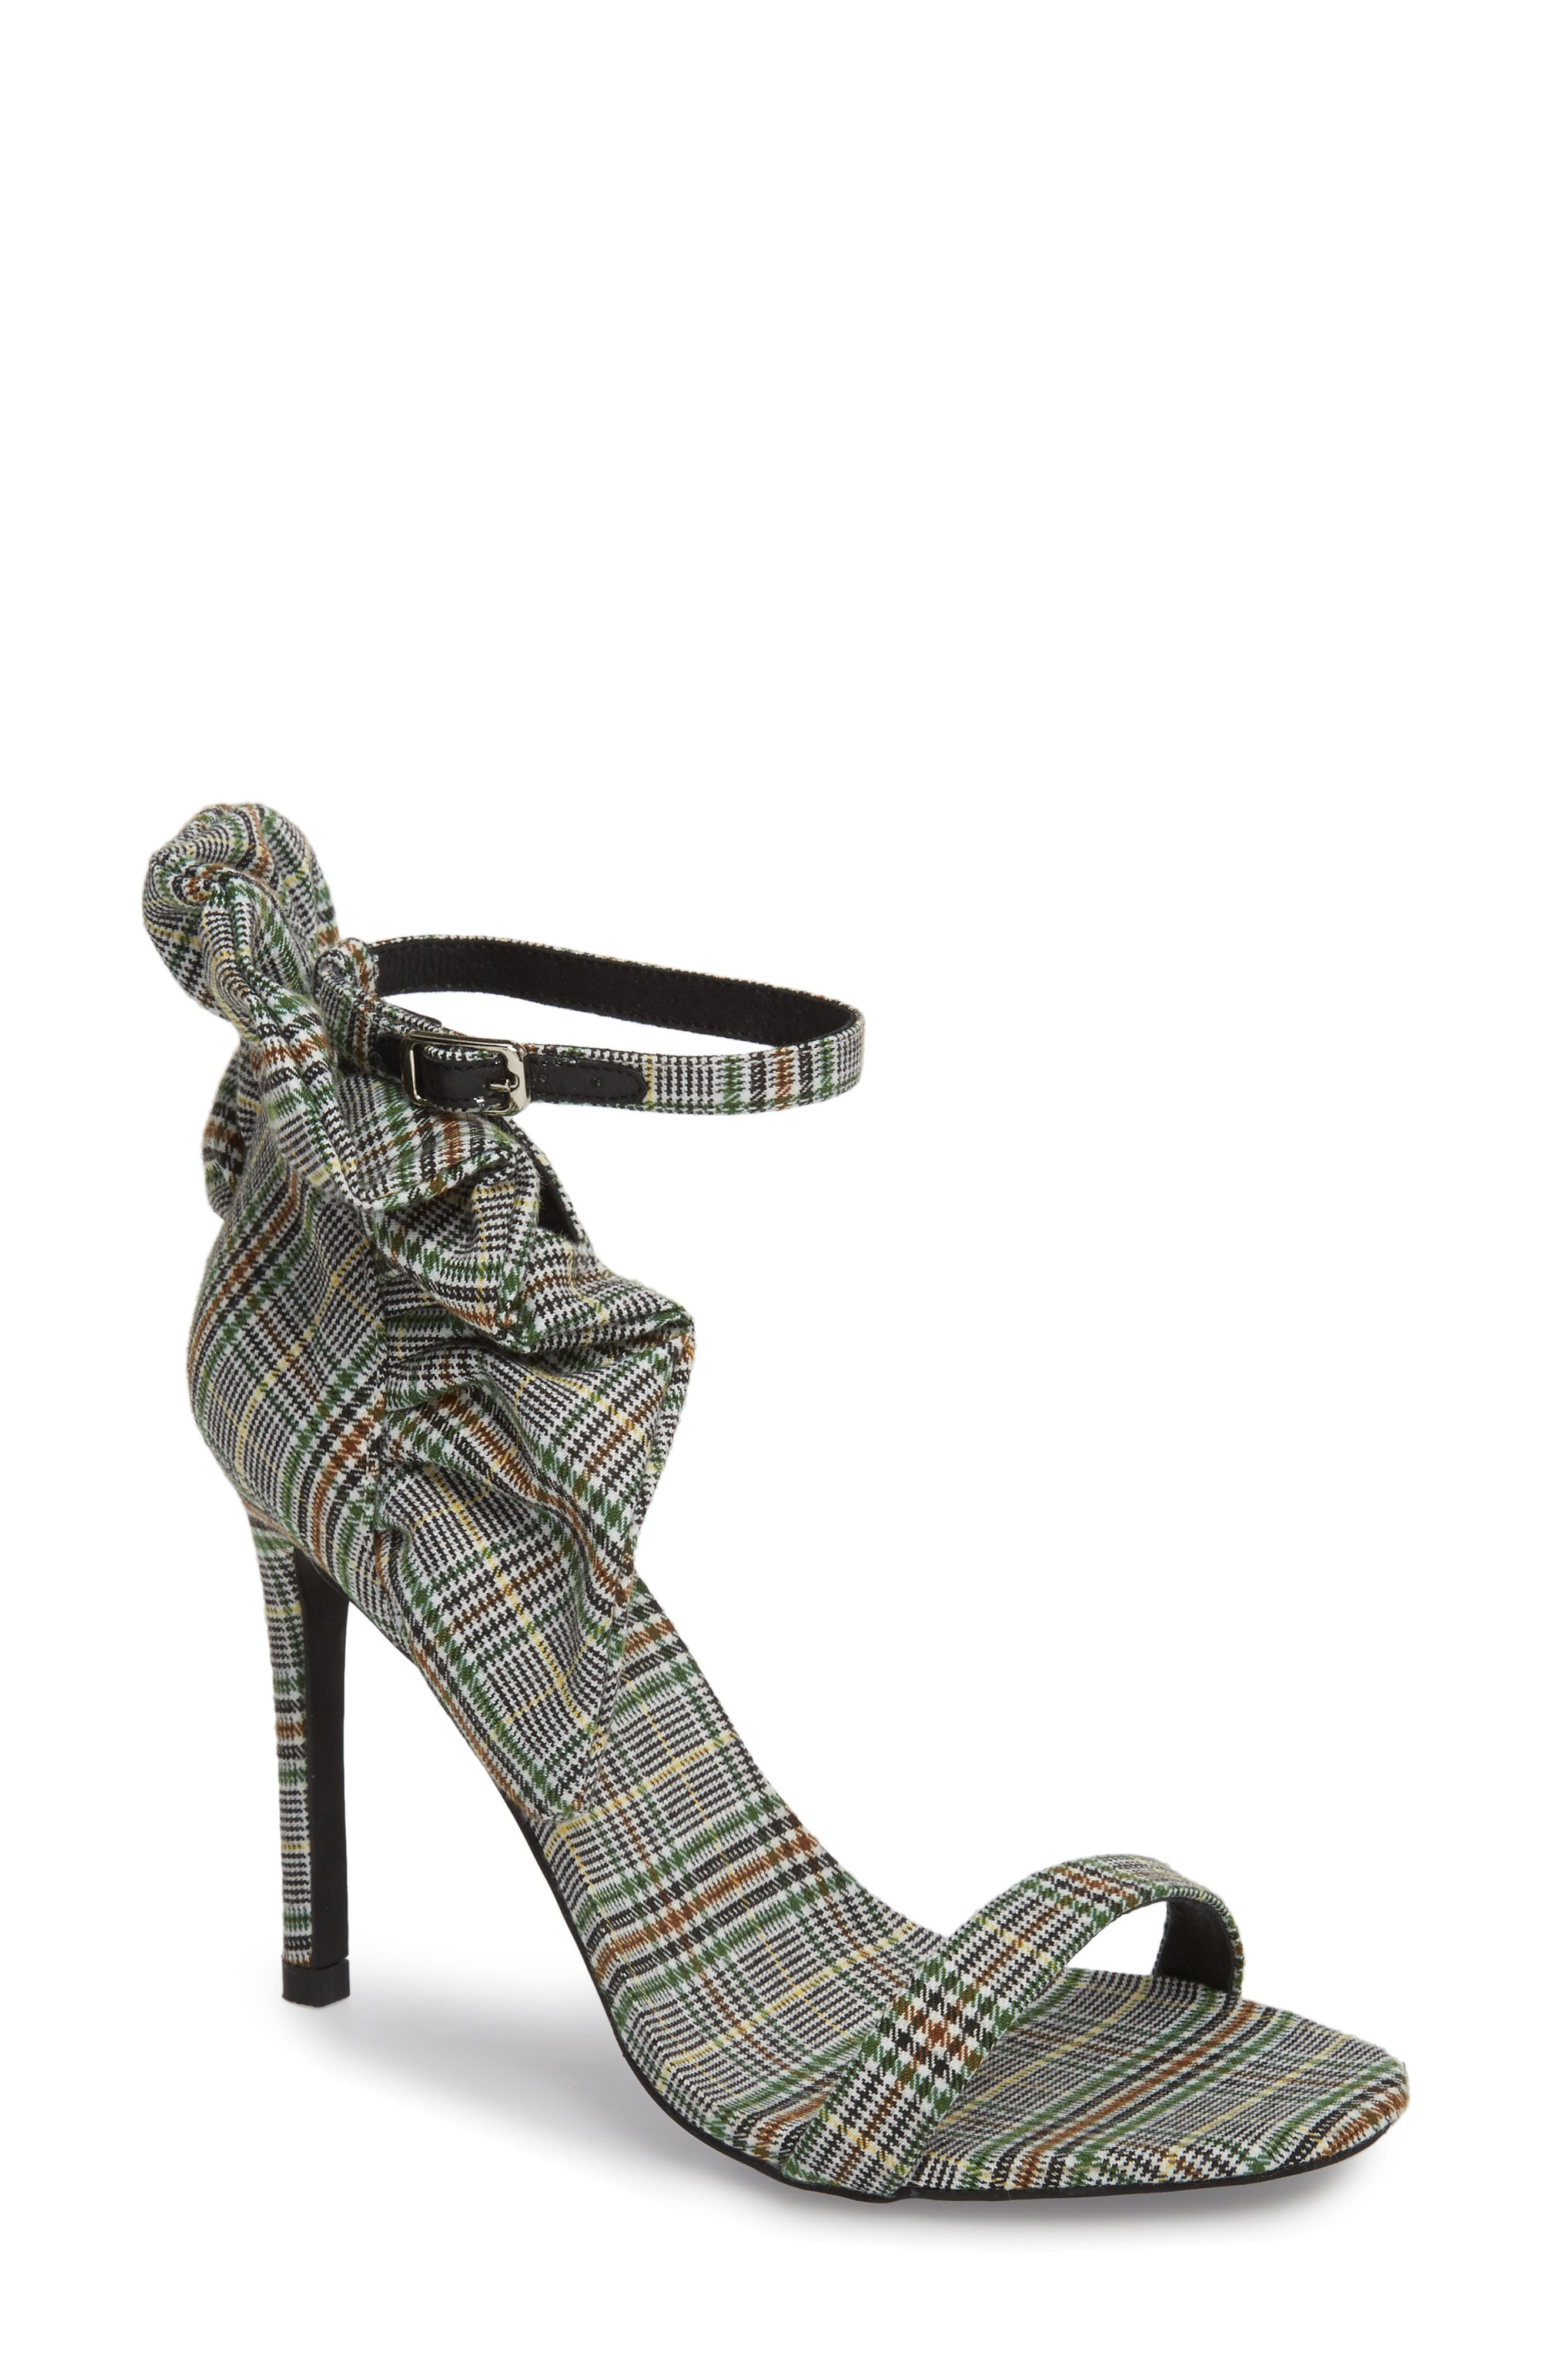 Cheshire Ruffle Sandal,                             Main thumbnail 1, color,                             Black/ White/ Green Fabric